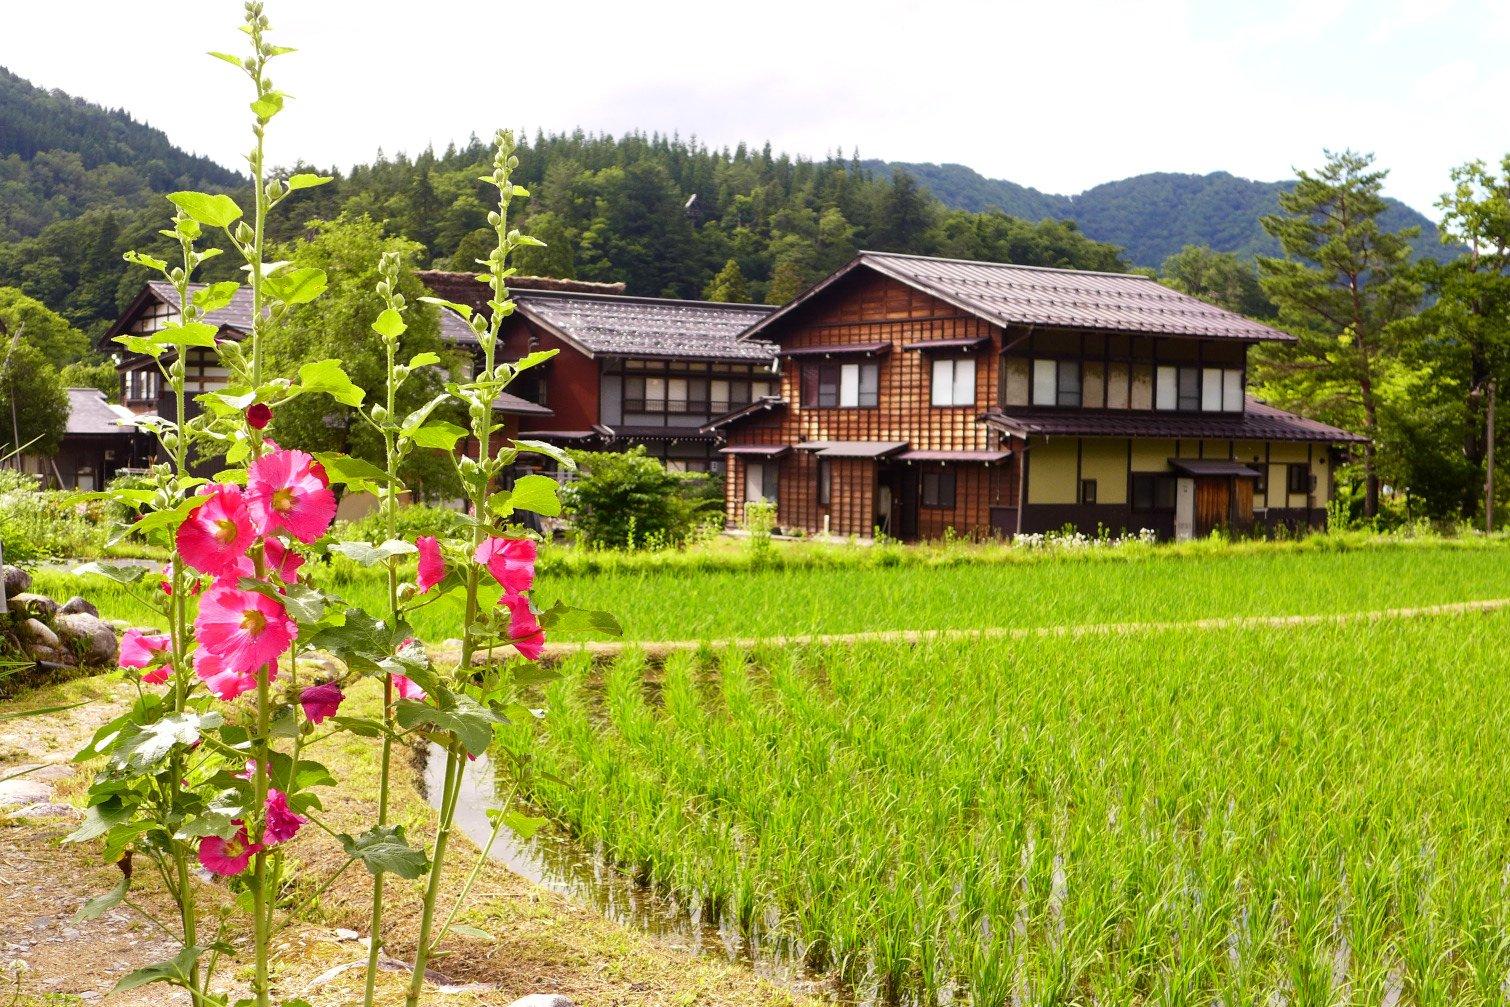 Shirakawa-go; Shirakawa-go Japan travel; What to do in Shirakawa-go Japan; What to see in Shirakawa-go Japan; D.I.Y. Japan itinerary